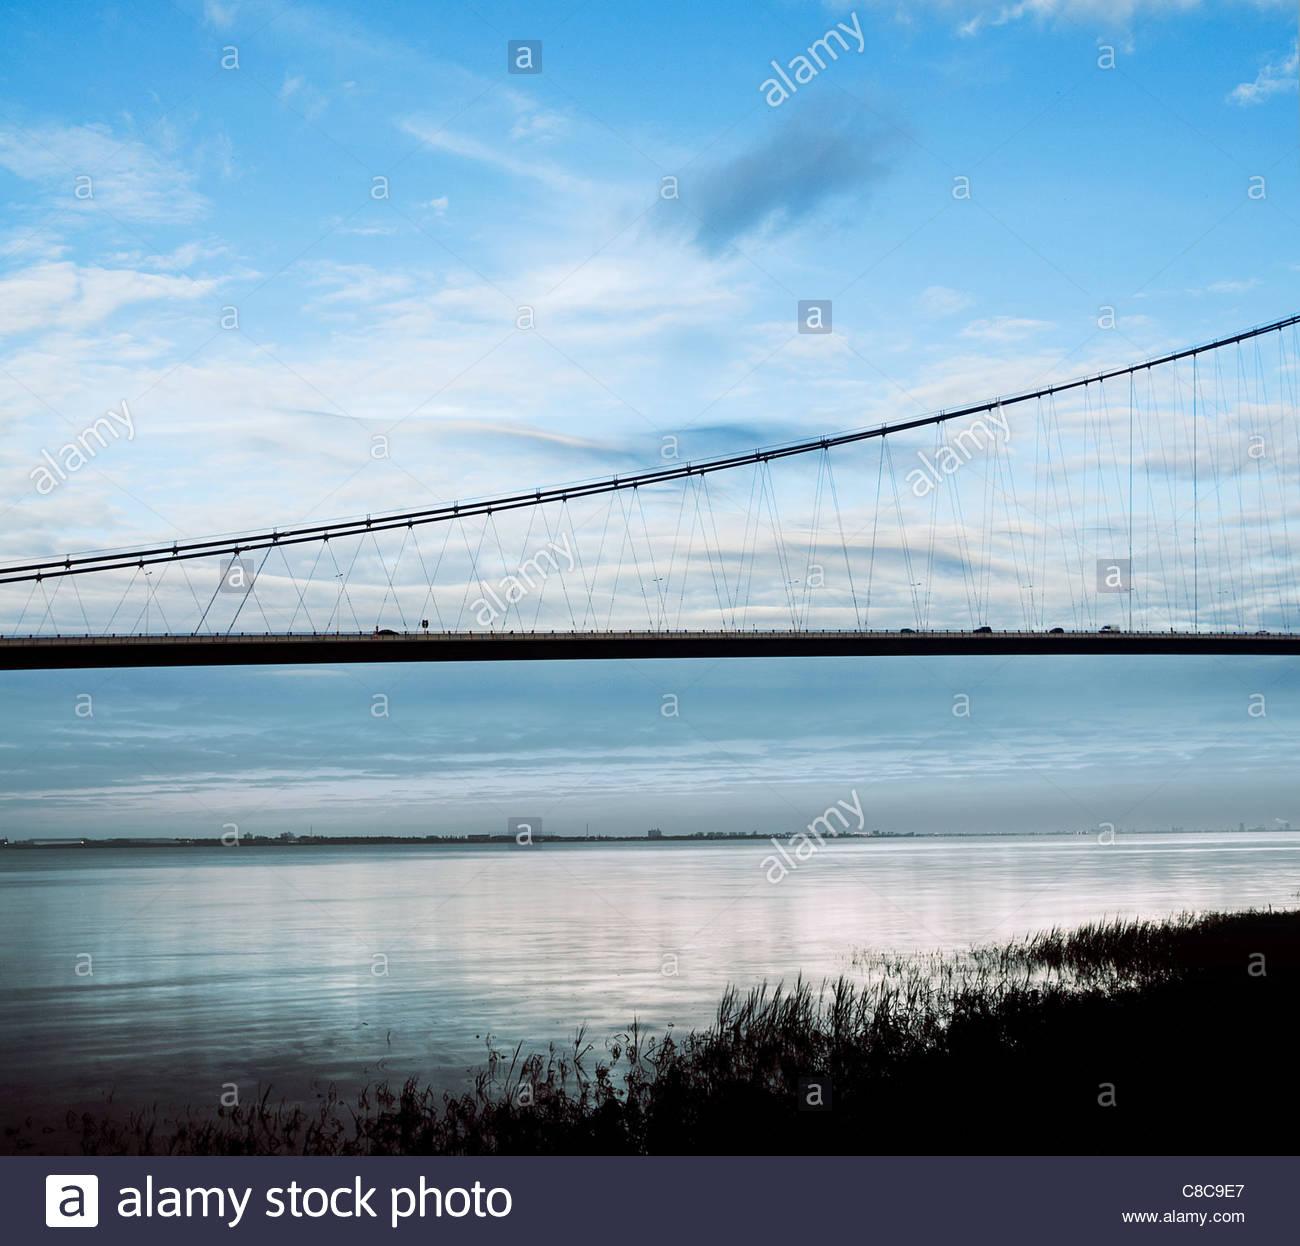 The Humber bridge - Stock Image